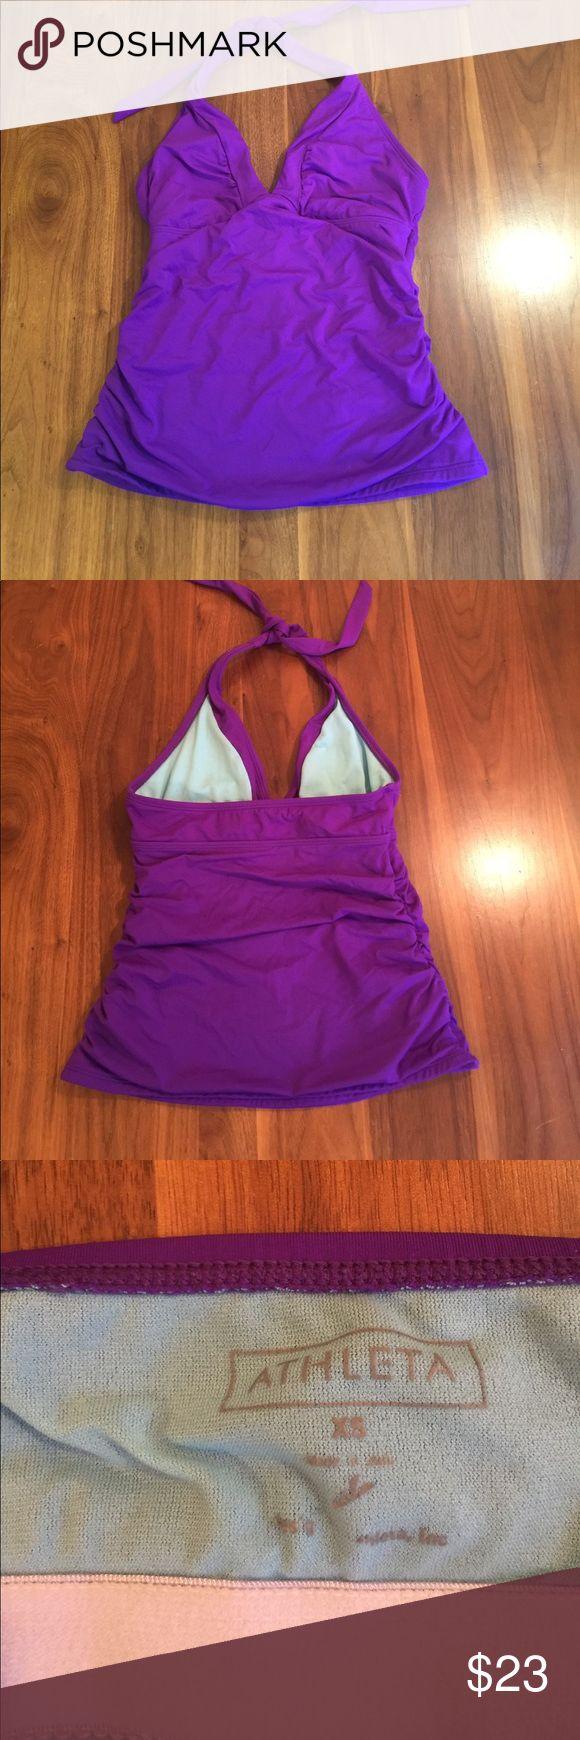 Athleta Halter Swim Tankini Purple tankini top with tie at neck. Athleta Swim